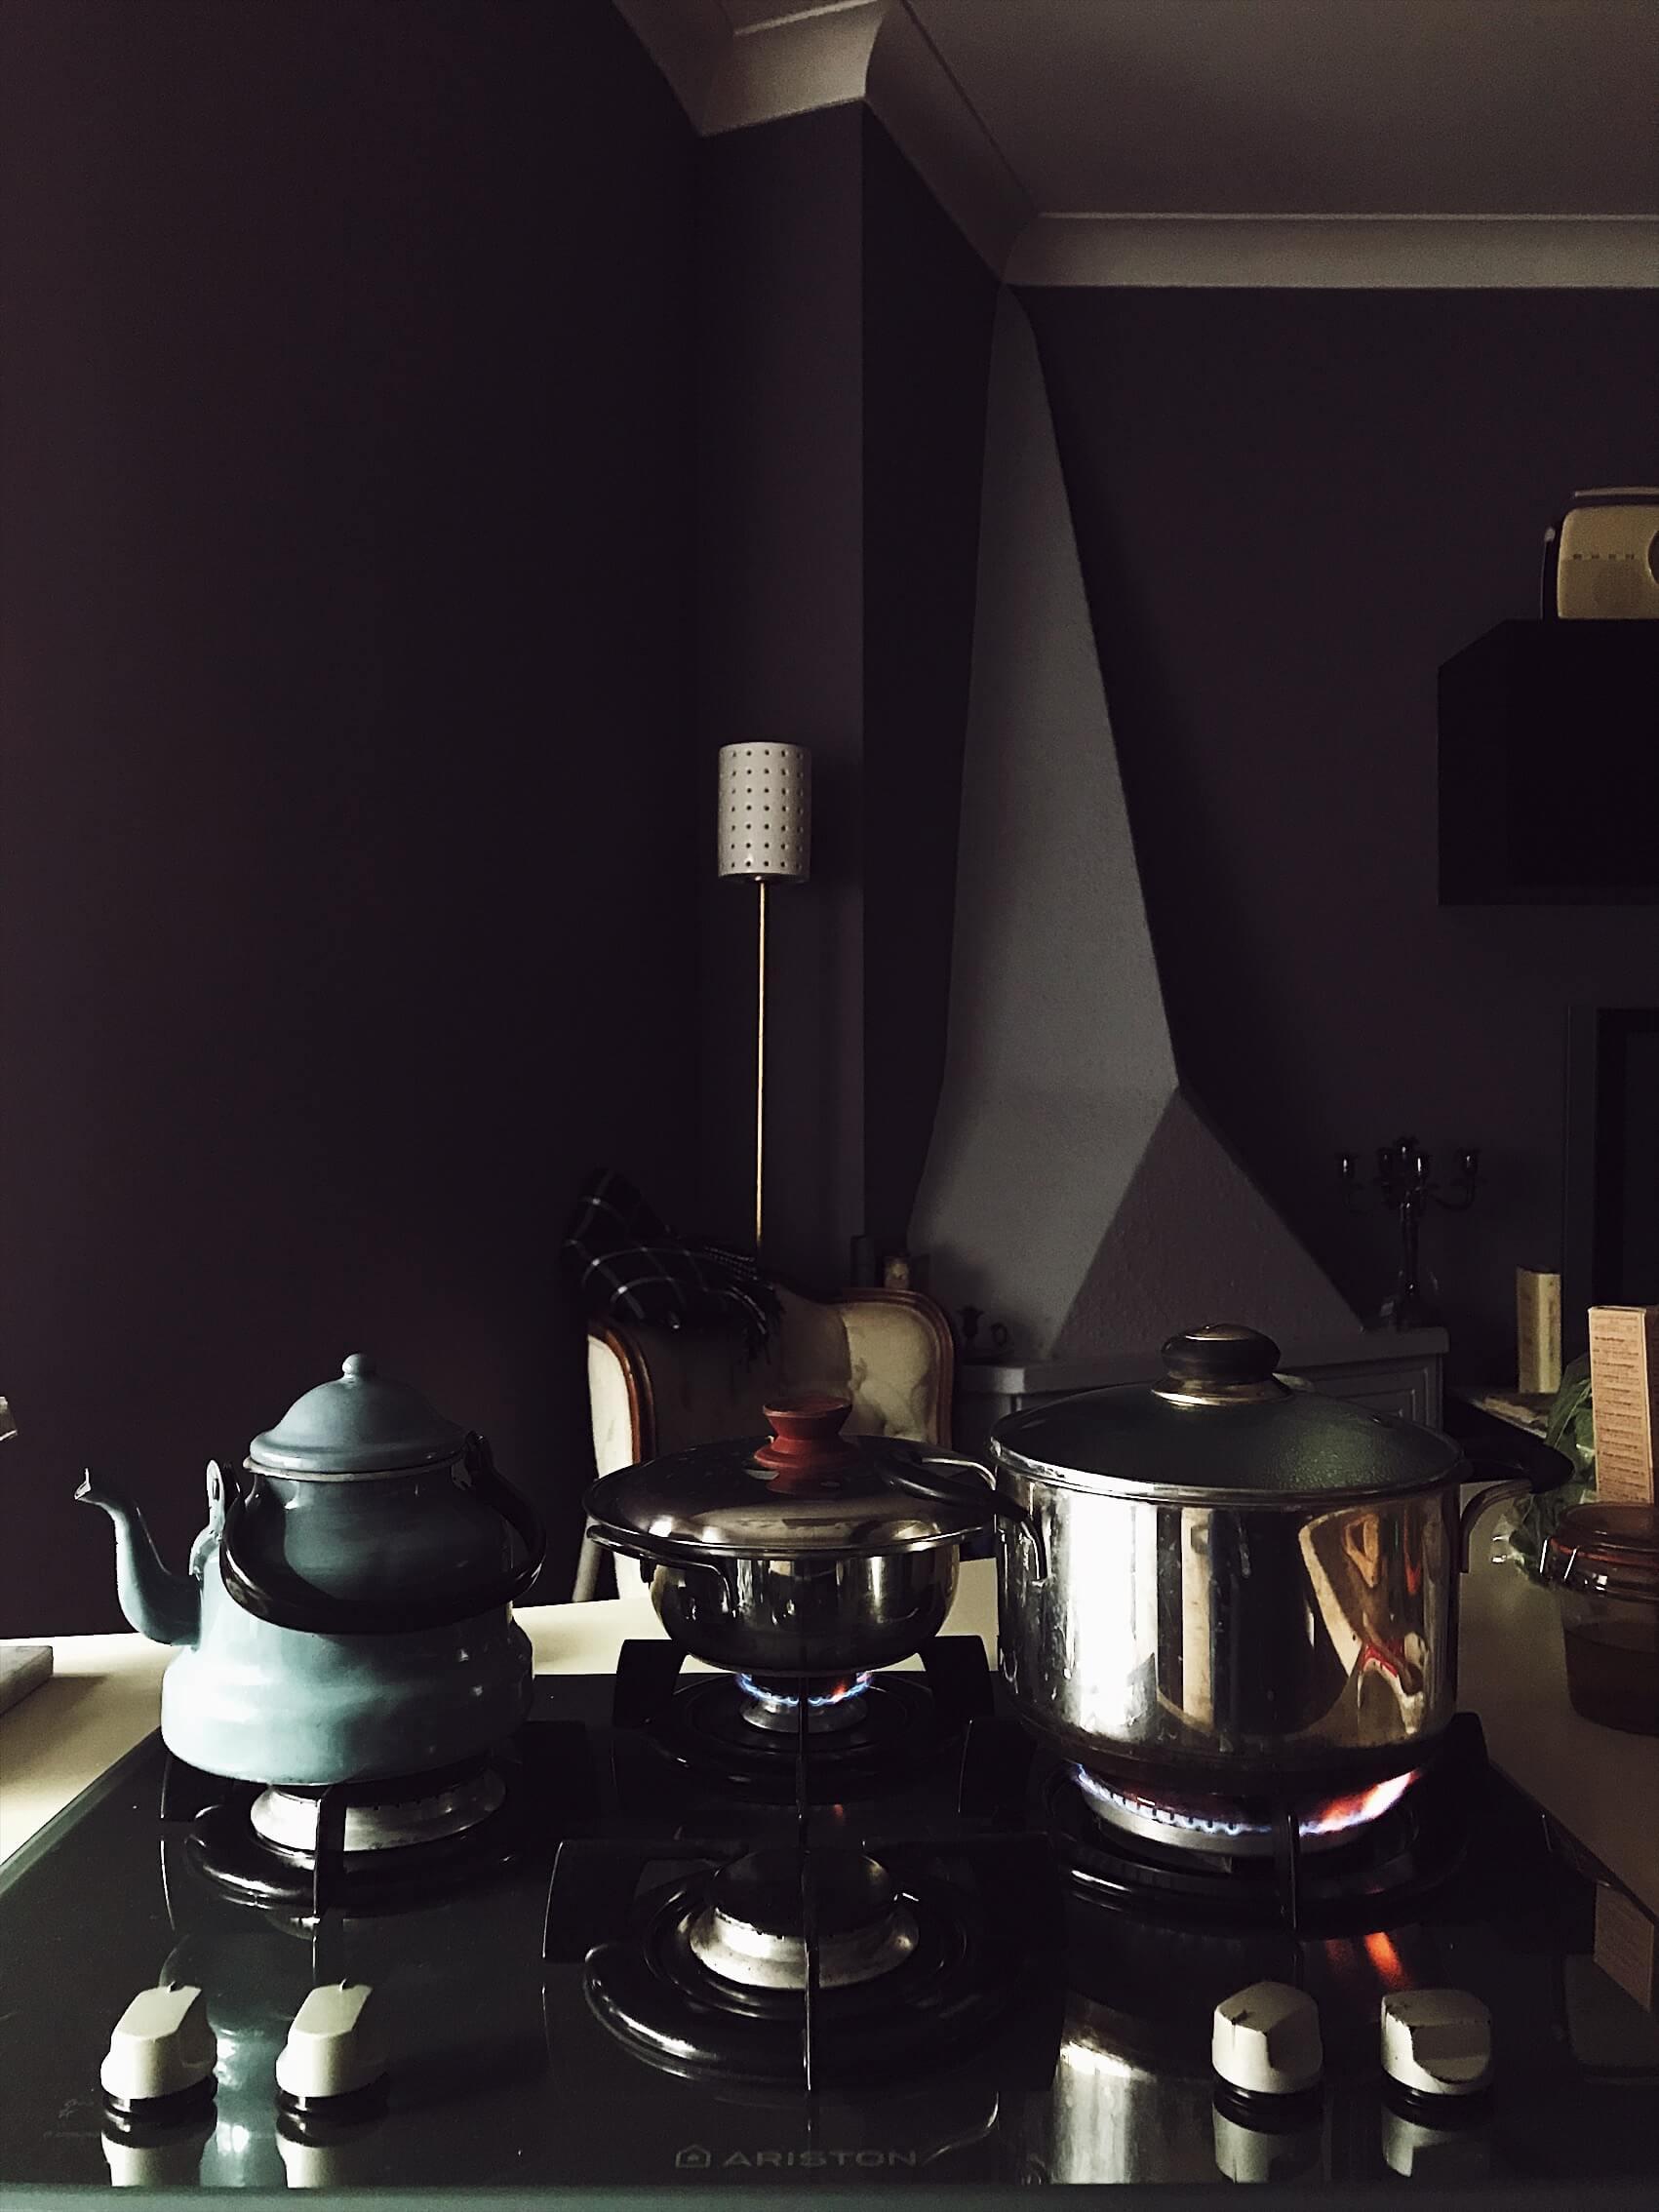 Christmas Eve pots on the stovetop